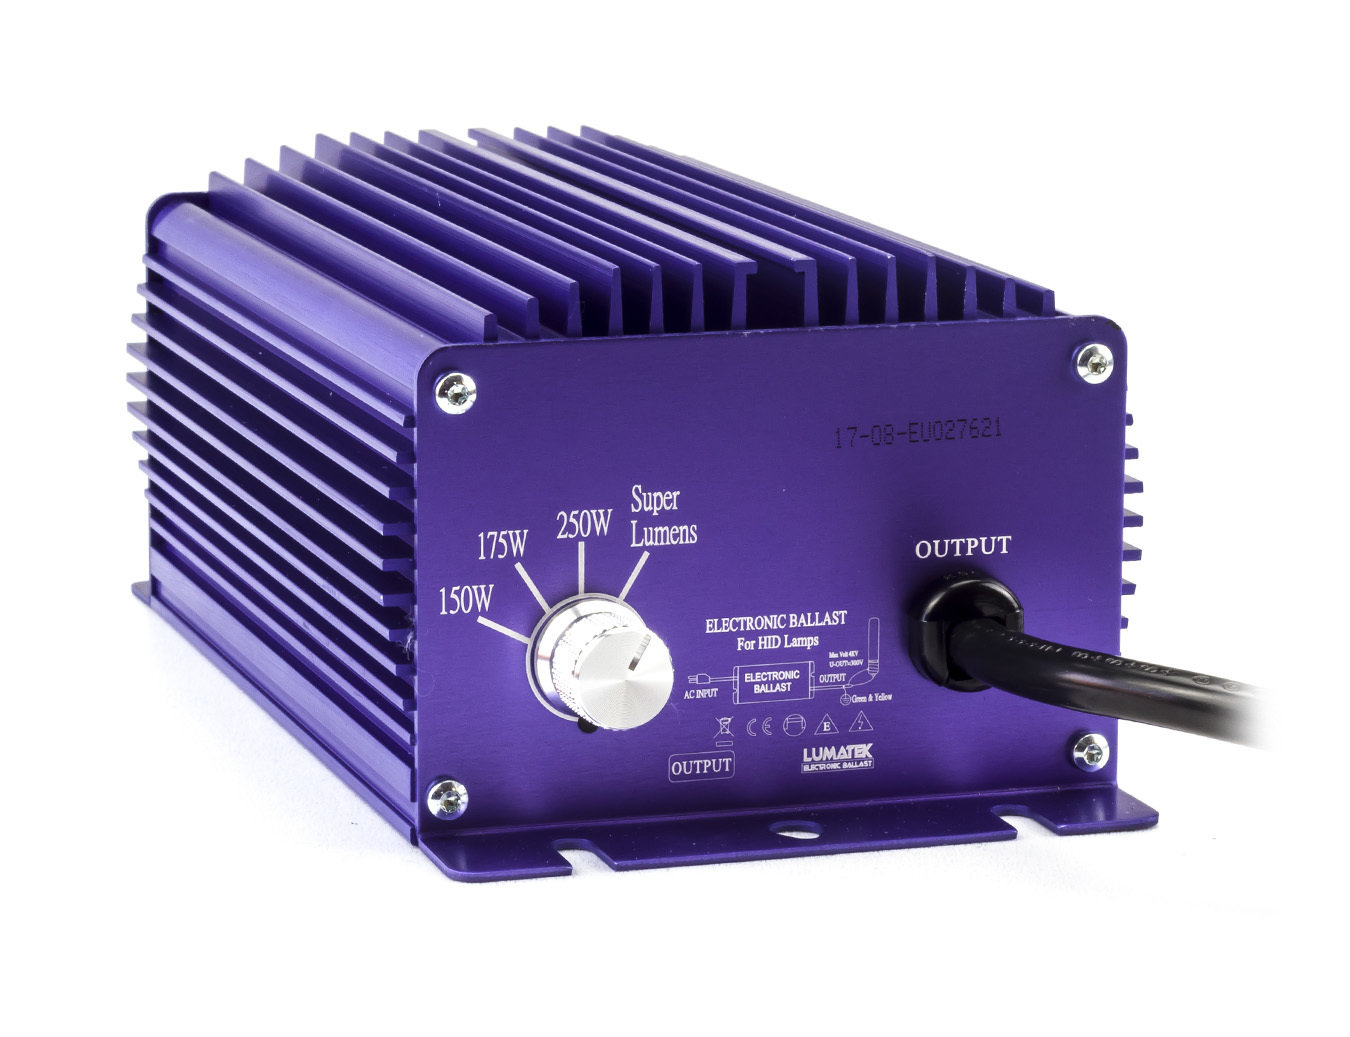 Балласт Lumatek 250-175-150W для HPS (ДНАТ) и MH (МГЛ) ламп